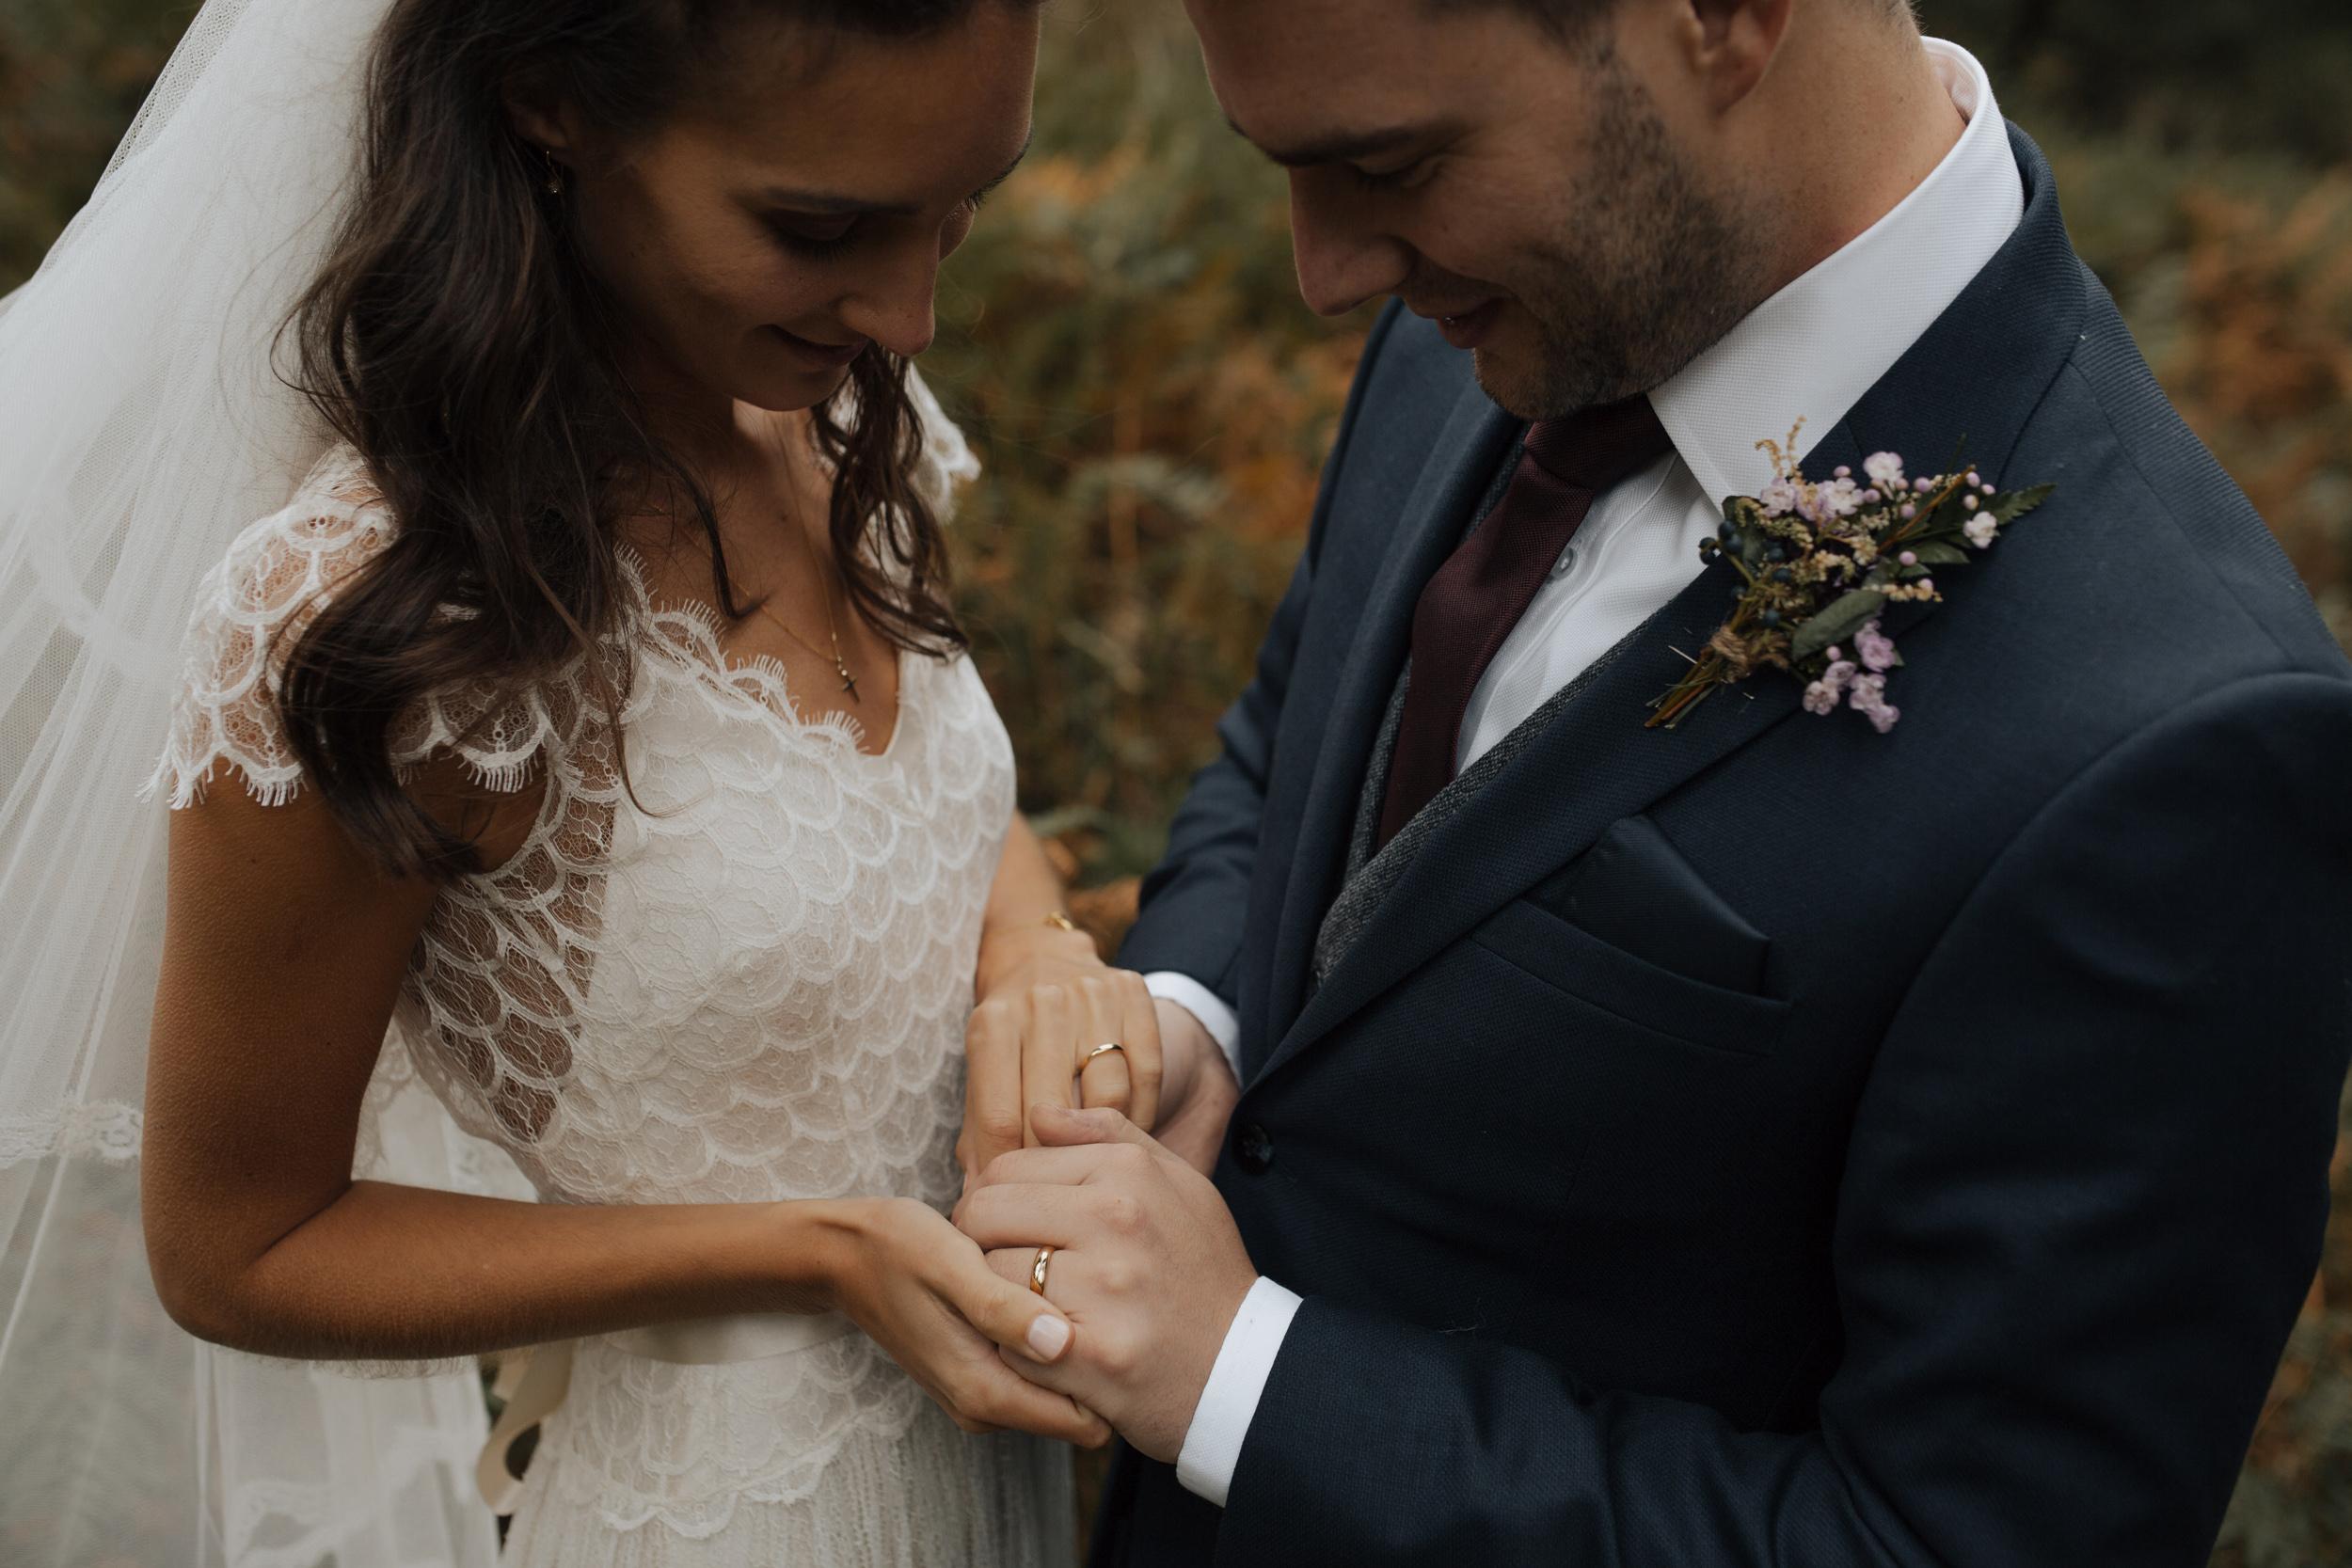 Joasia-Kate-Beaumont-Bohemian-Lace-Wedding-Dress-Peak-District-Sheffield-Wedding-36.jpg